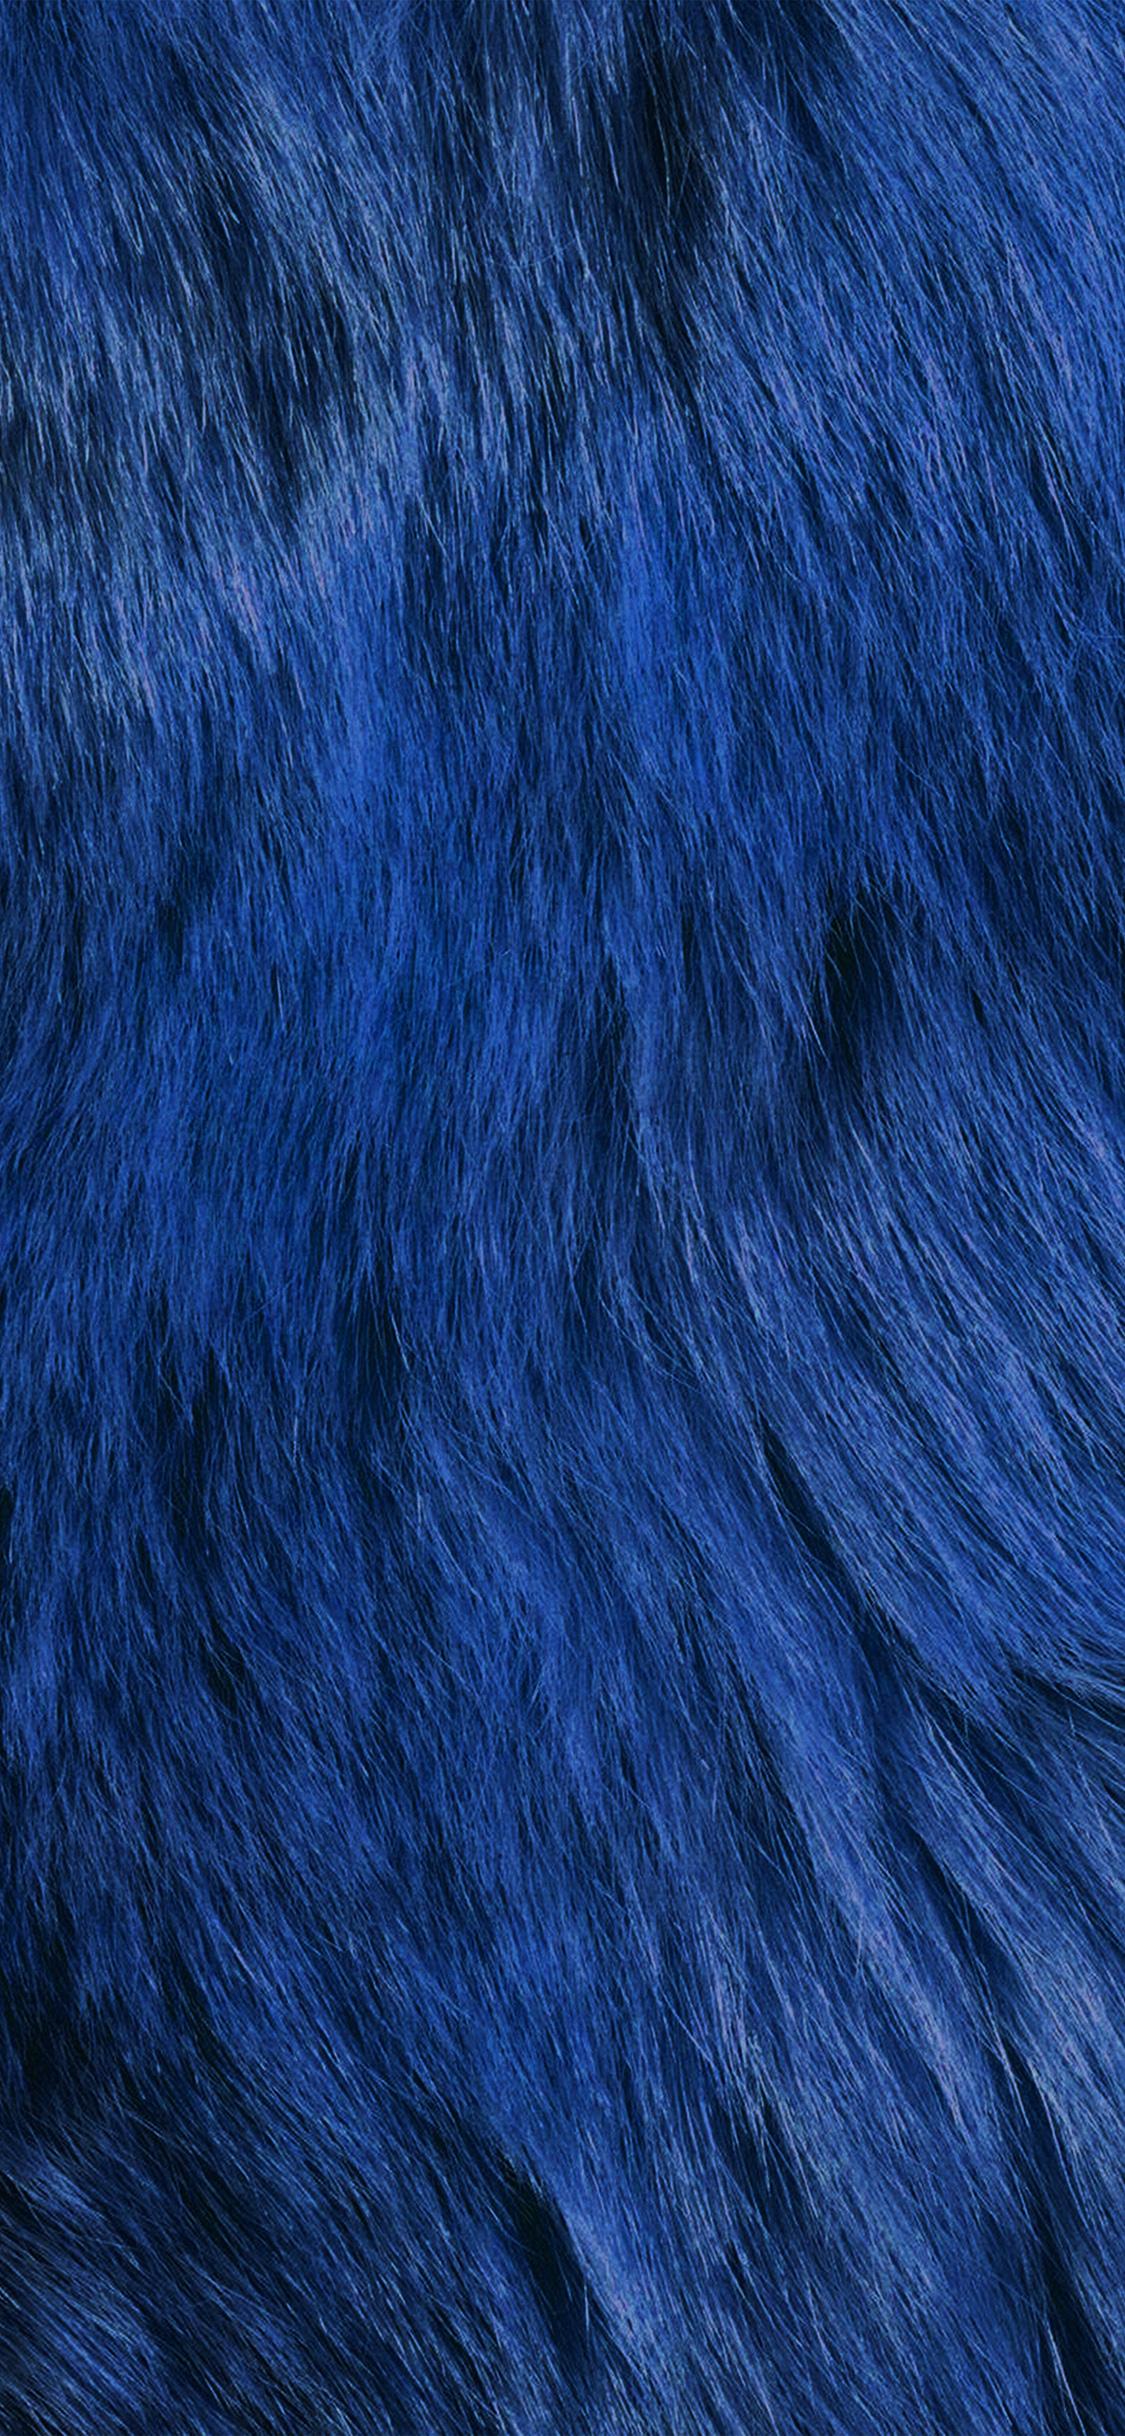 iPhonexpapers.com-Apple-iPhone-wallpaper-vt38-texture-fur-dog-blue-pattern-dark